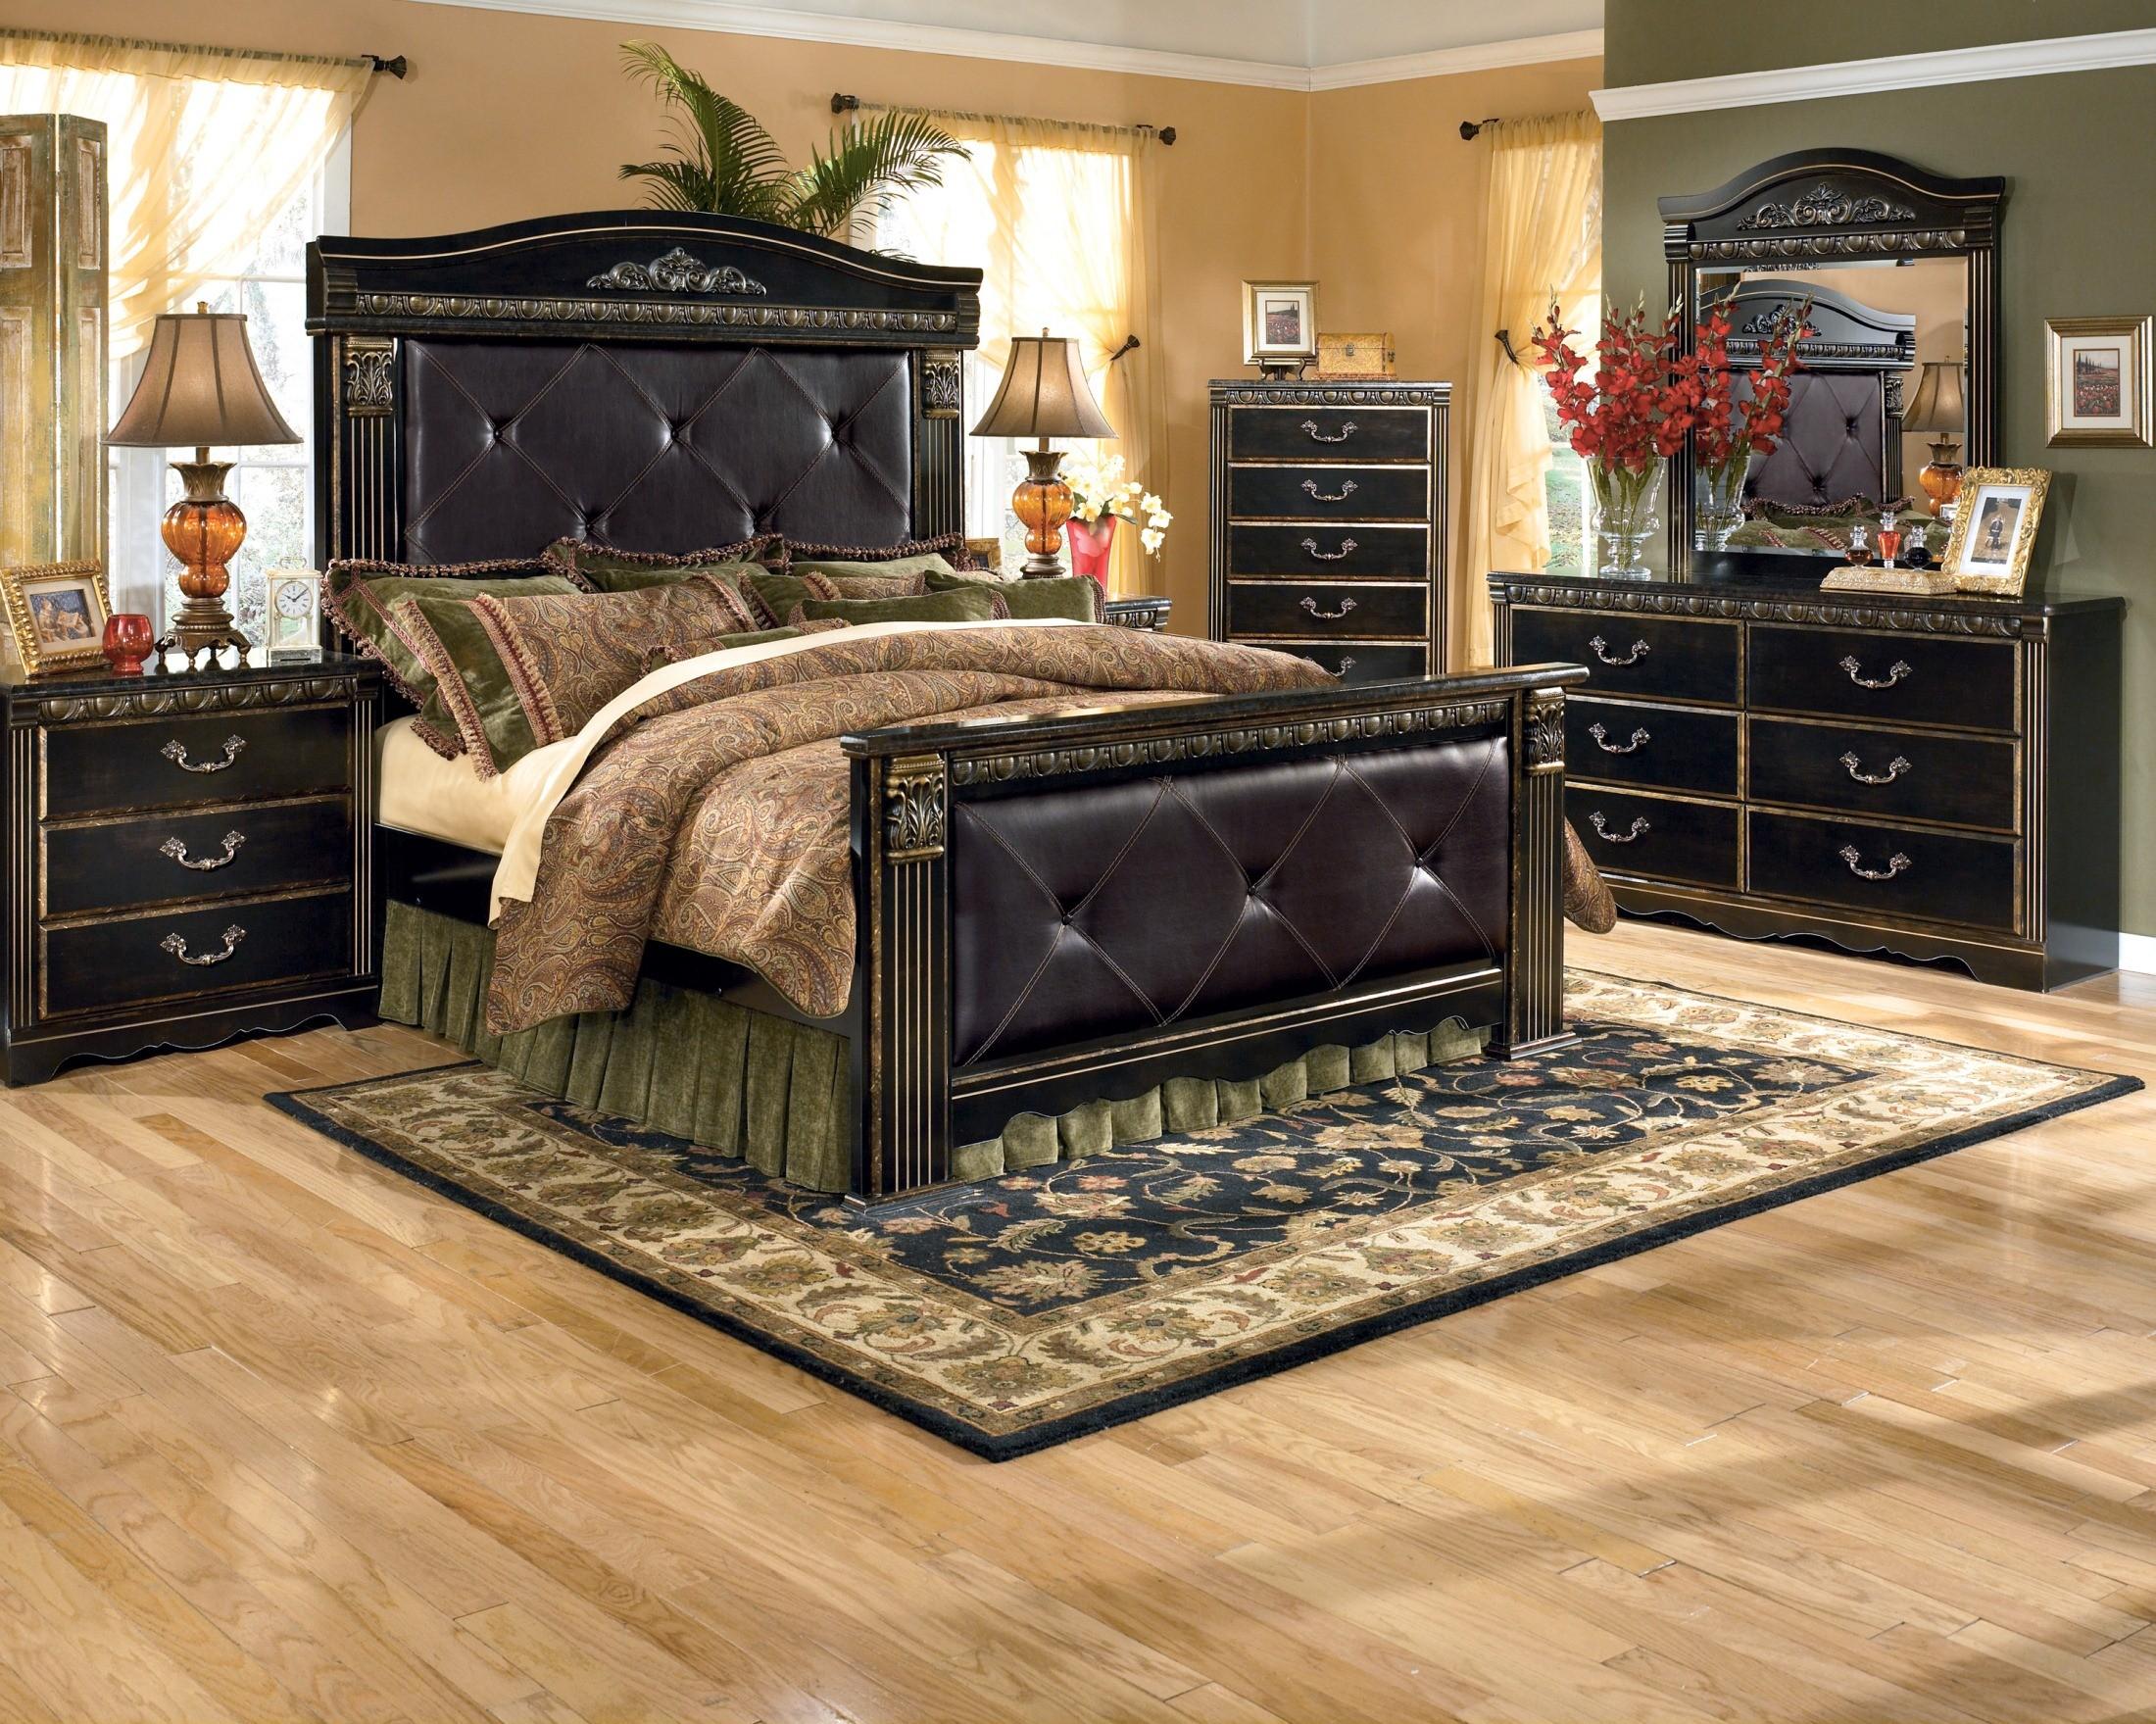 Coal Creek Mansion Bedroom Set From Ashley B Coleman Furniture - Ashley bedroom furniture collections